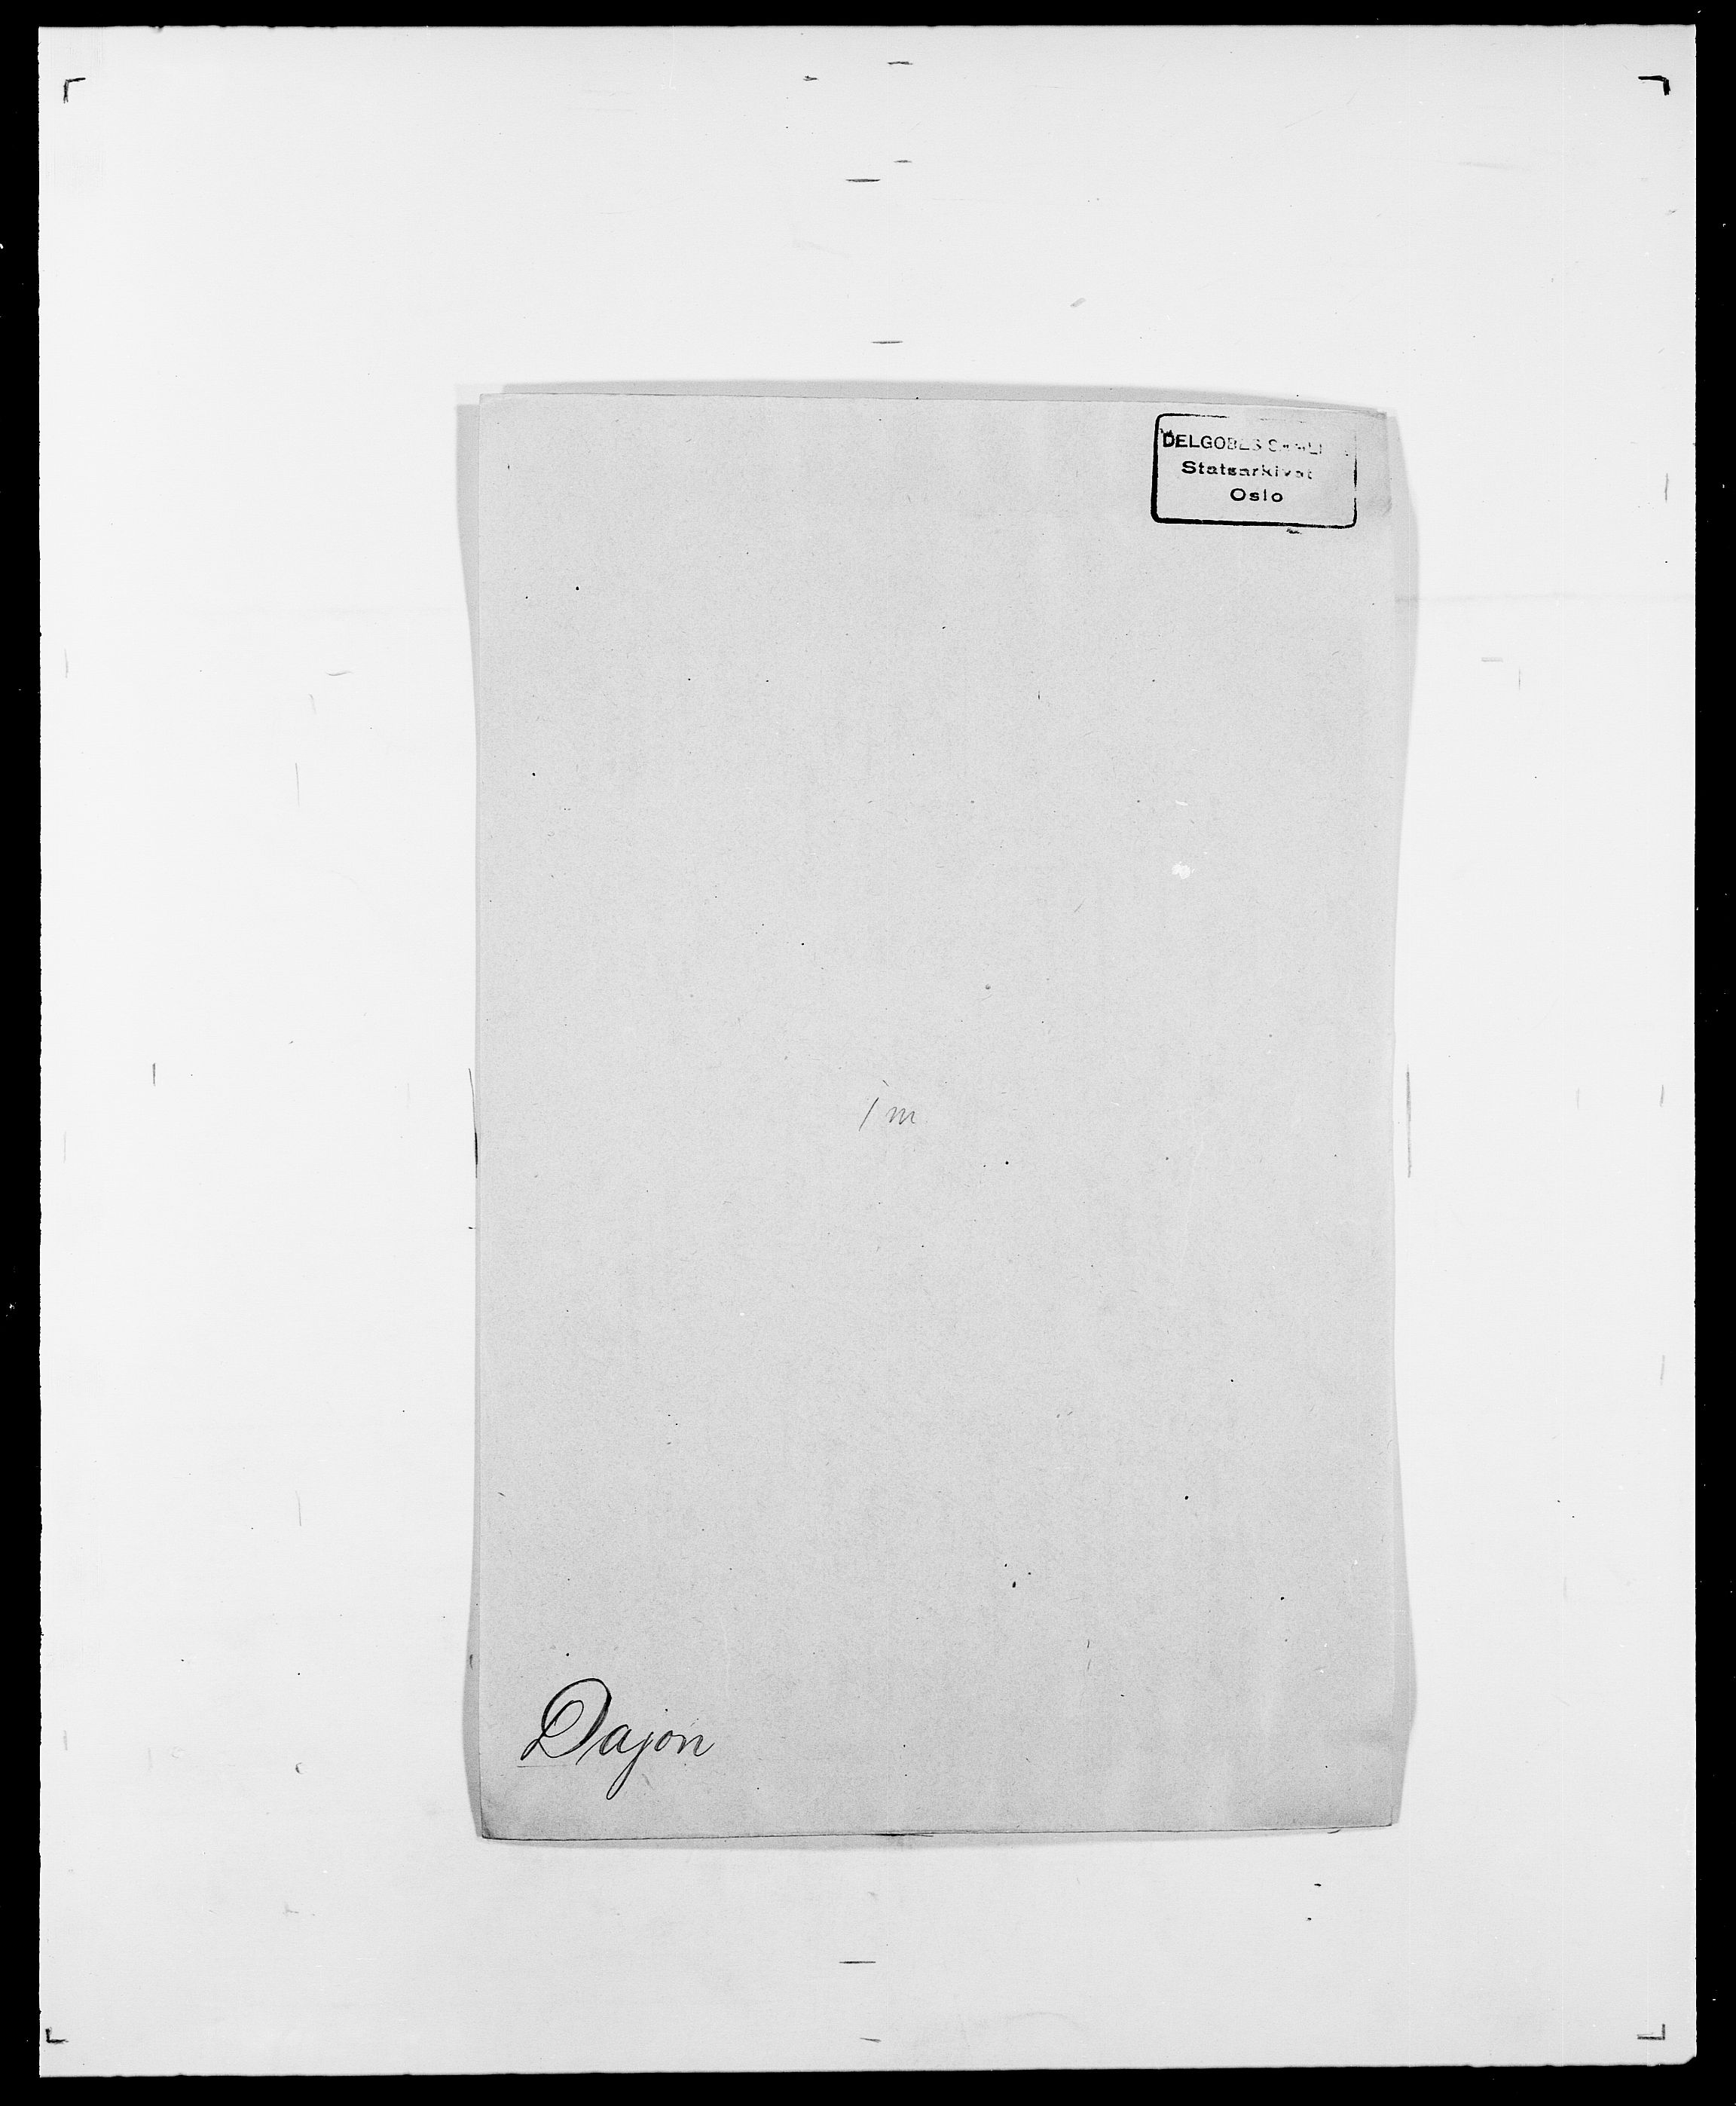 SAO, Delgobe, Charles Antoine - samling, D/Da/L0009: Dahl - v. Düren, s. 244